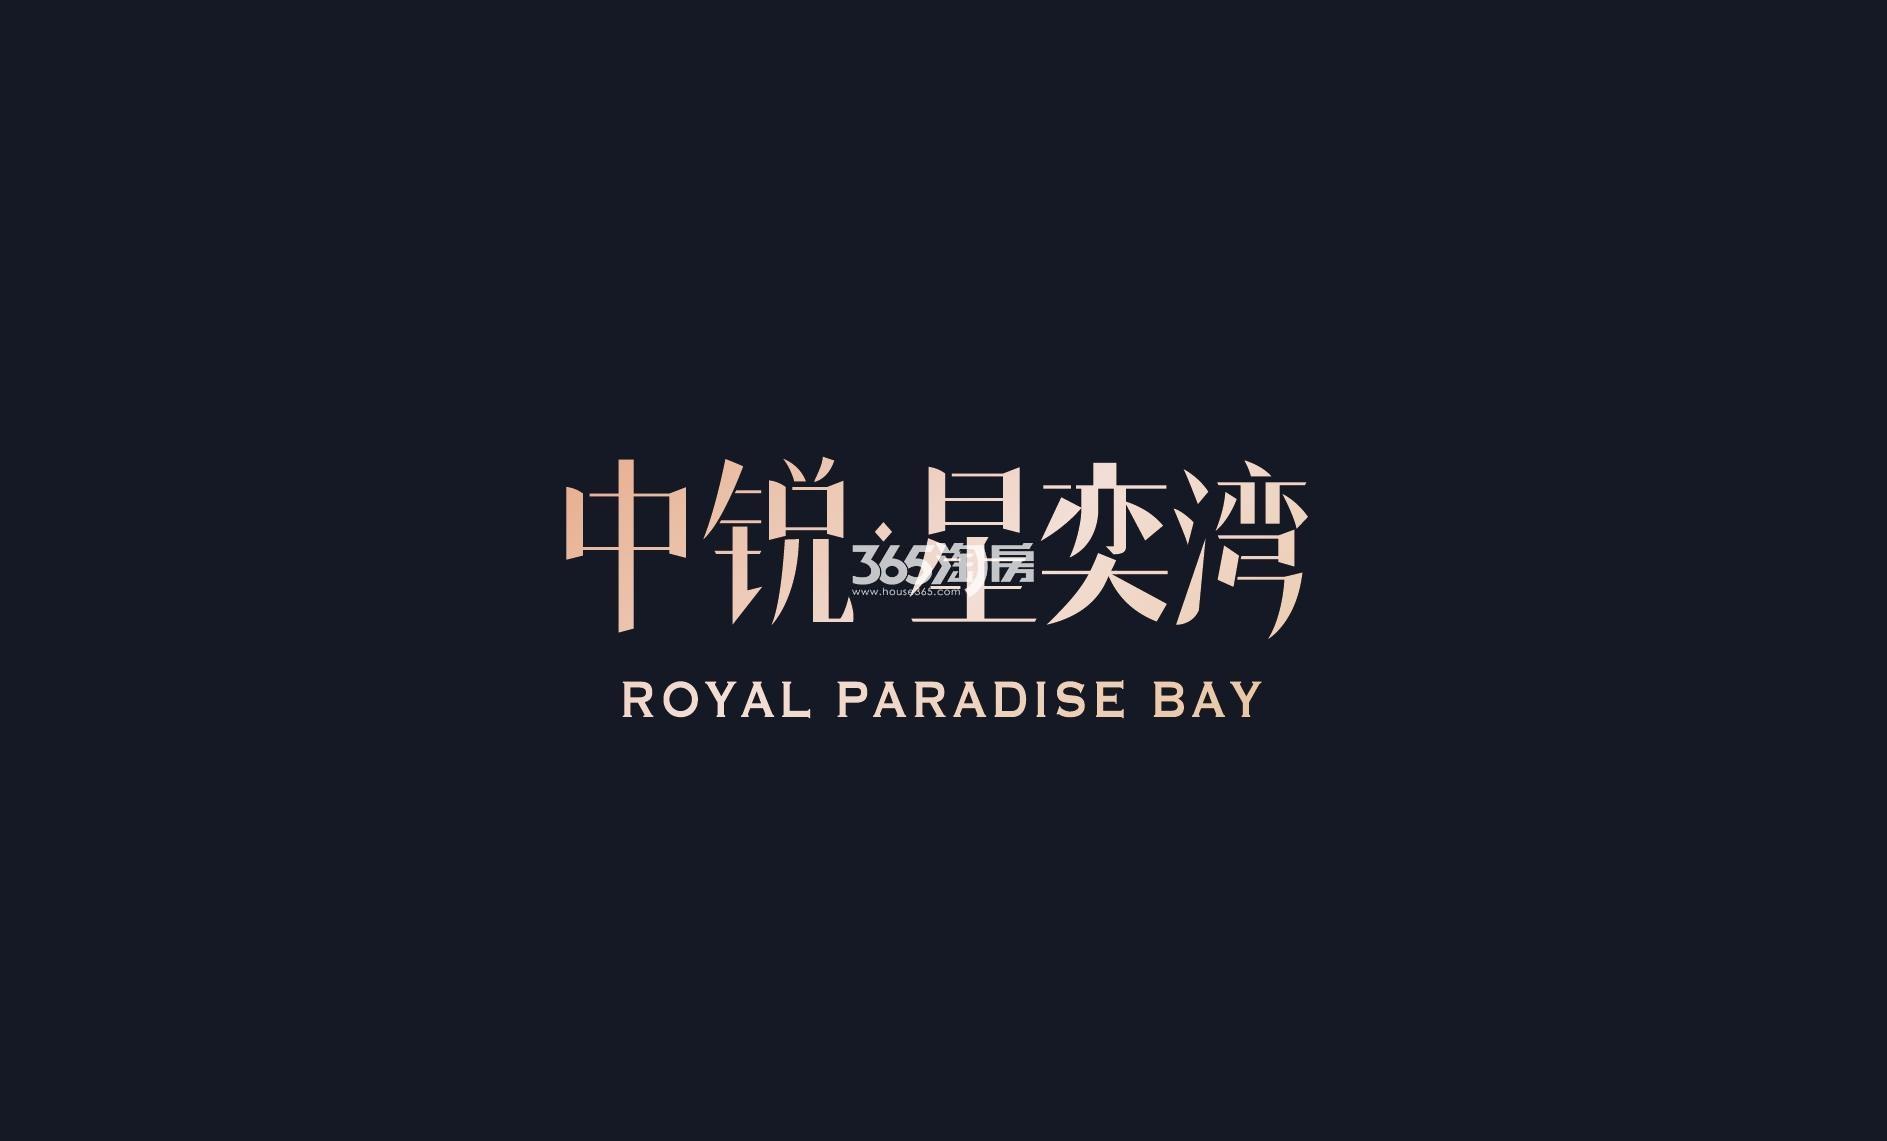 中锐星奕湾logo